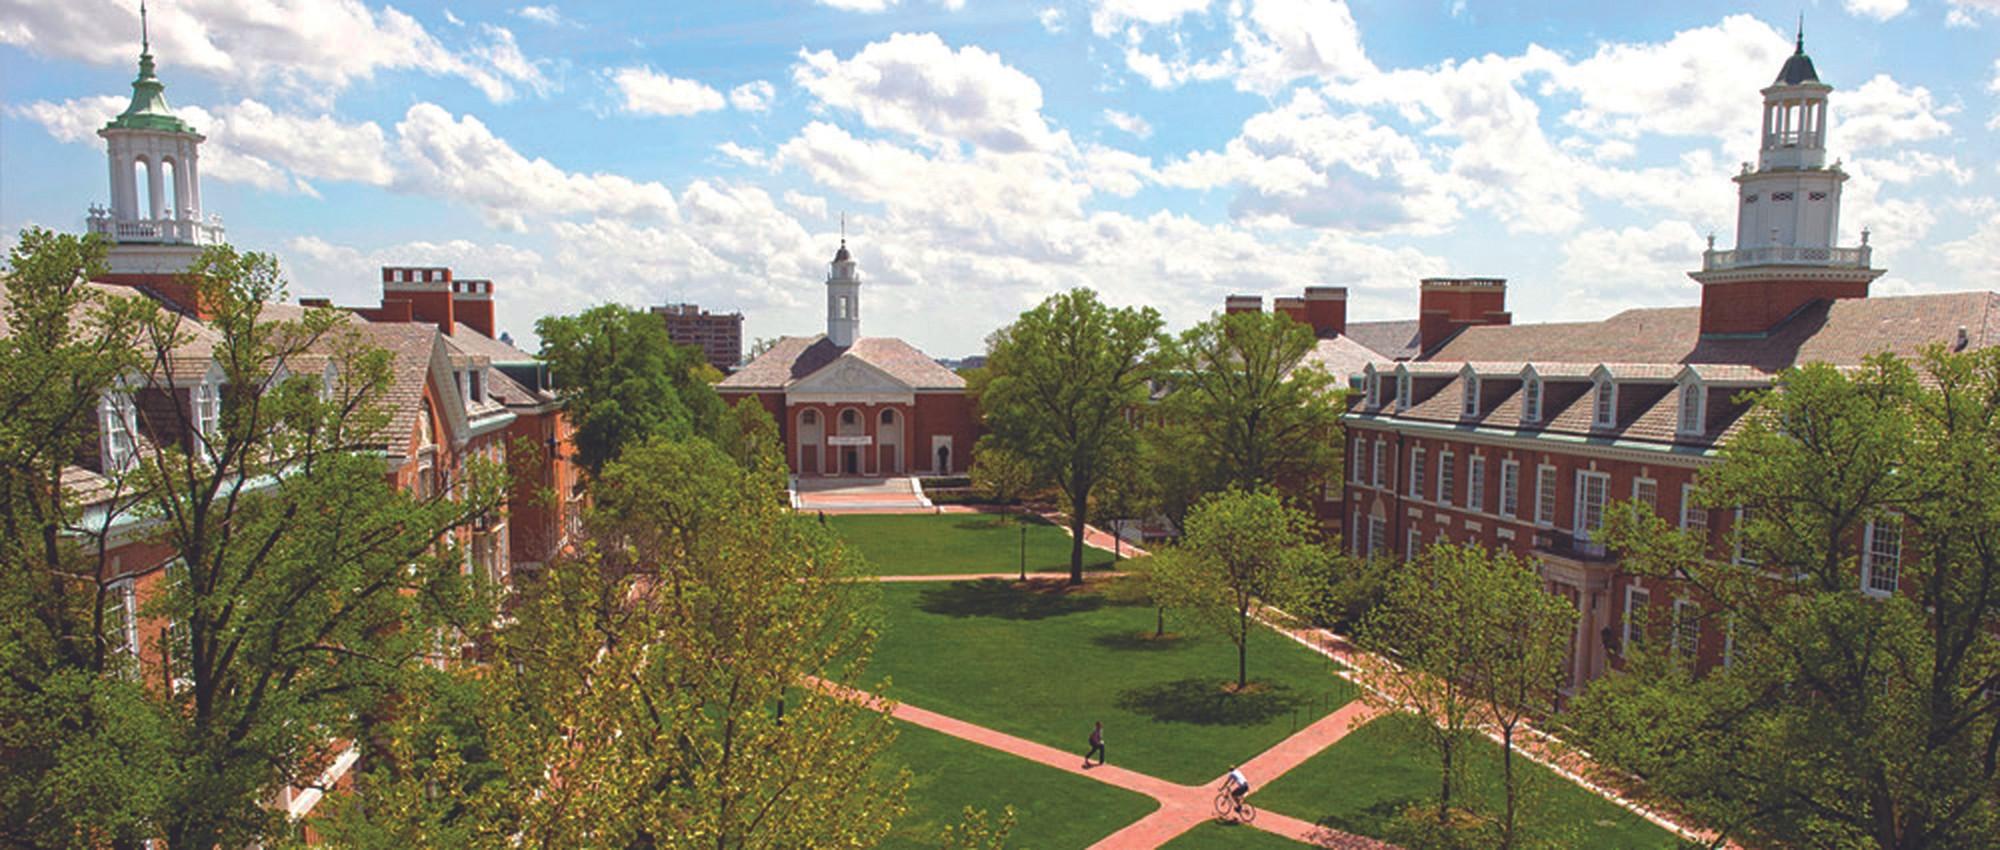 Campus shot of Johns Hopkins University